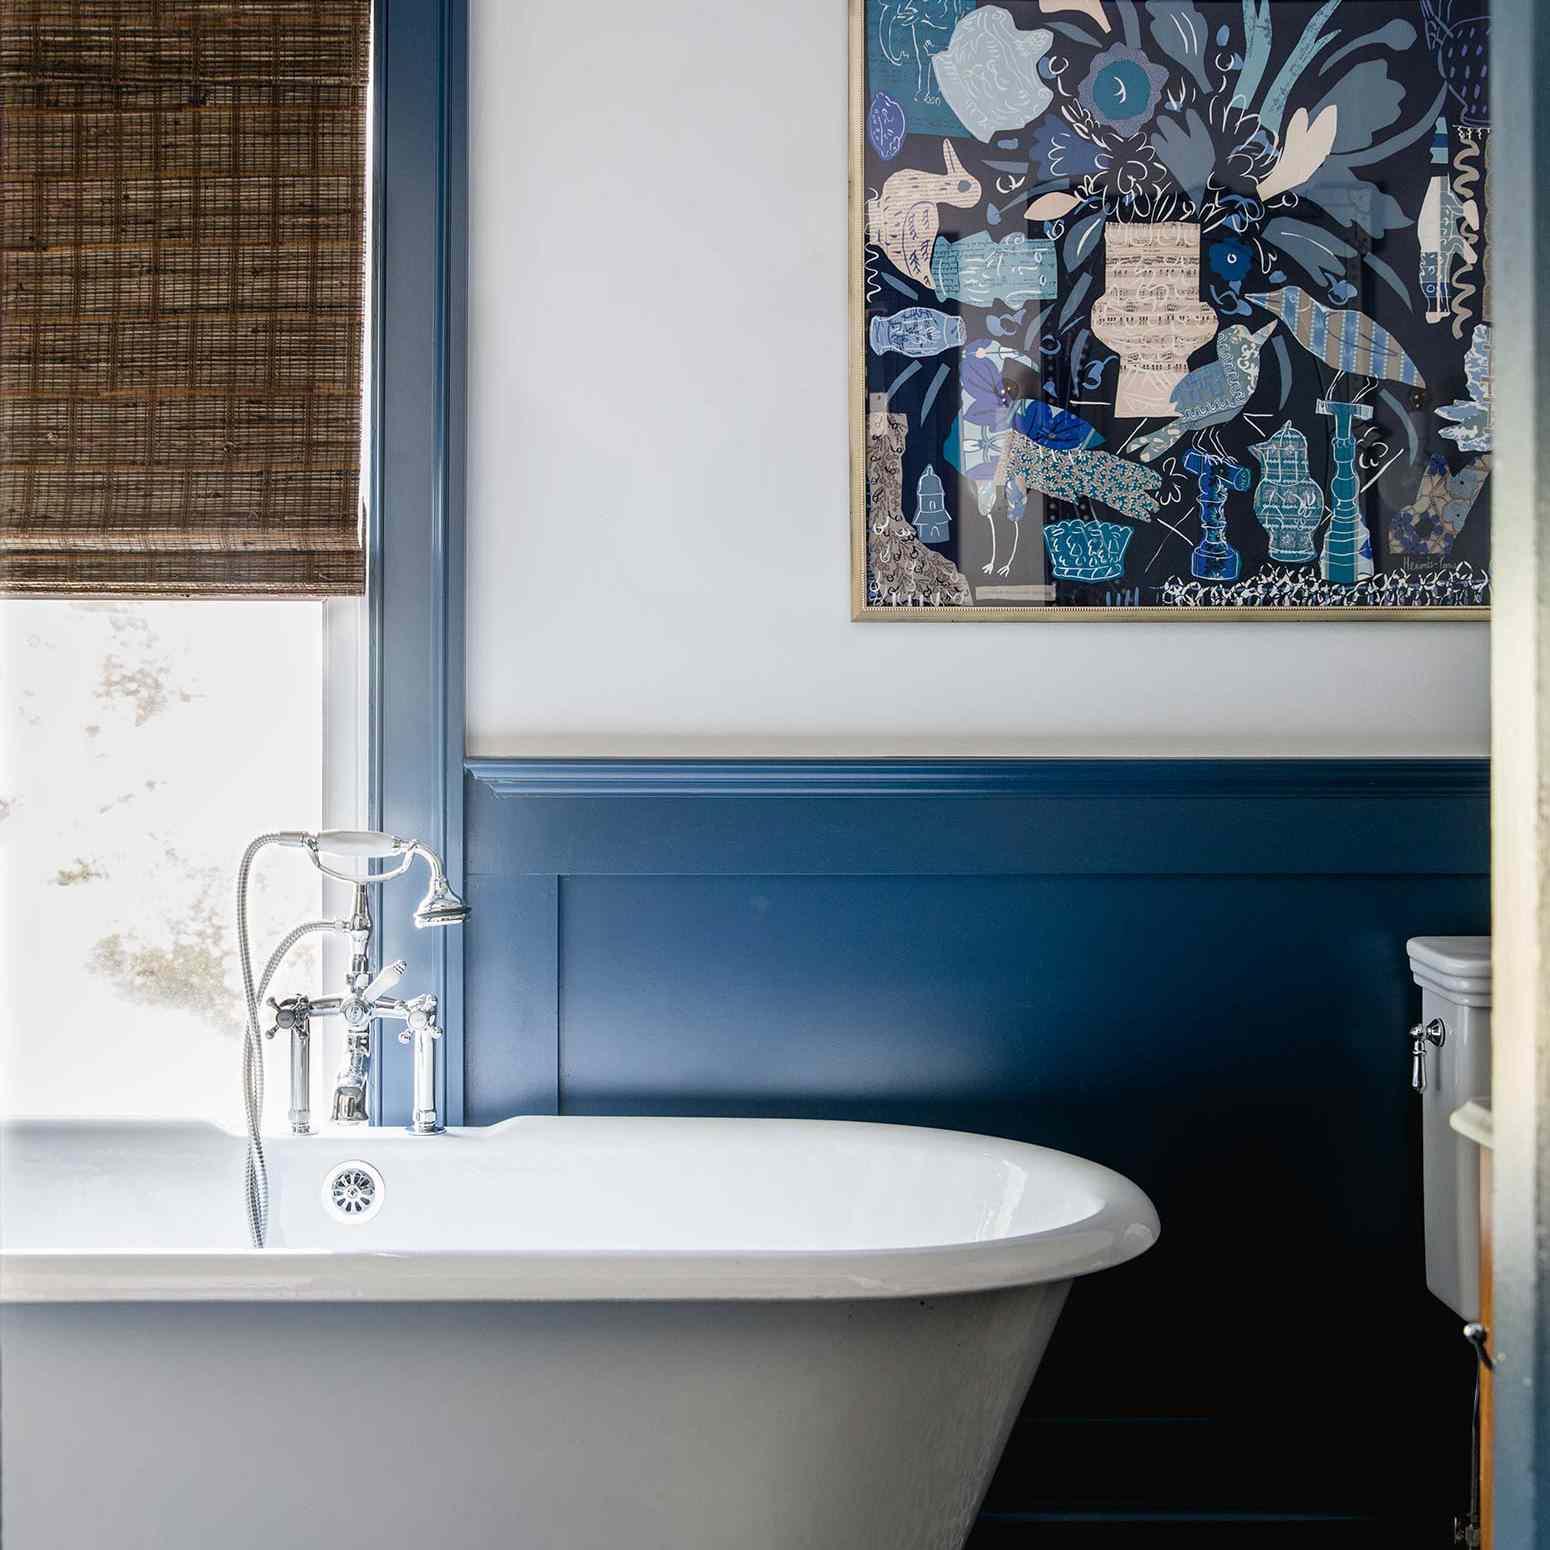 Bright blue bathroom with historic charm